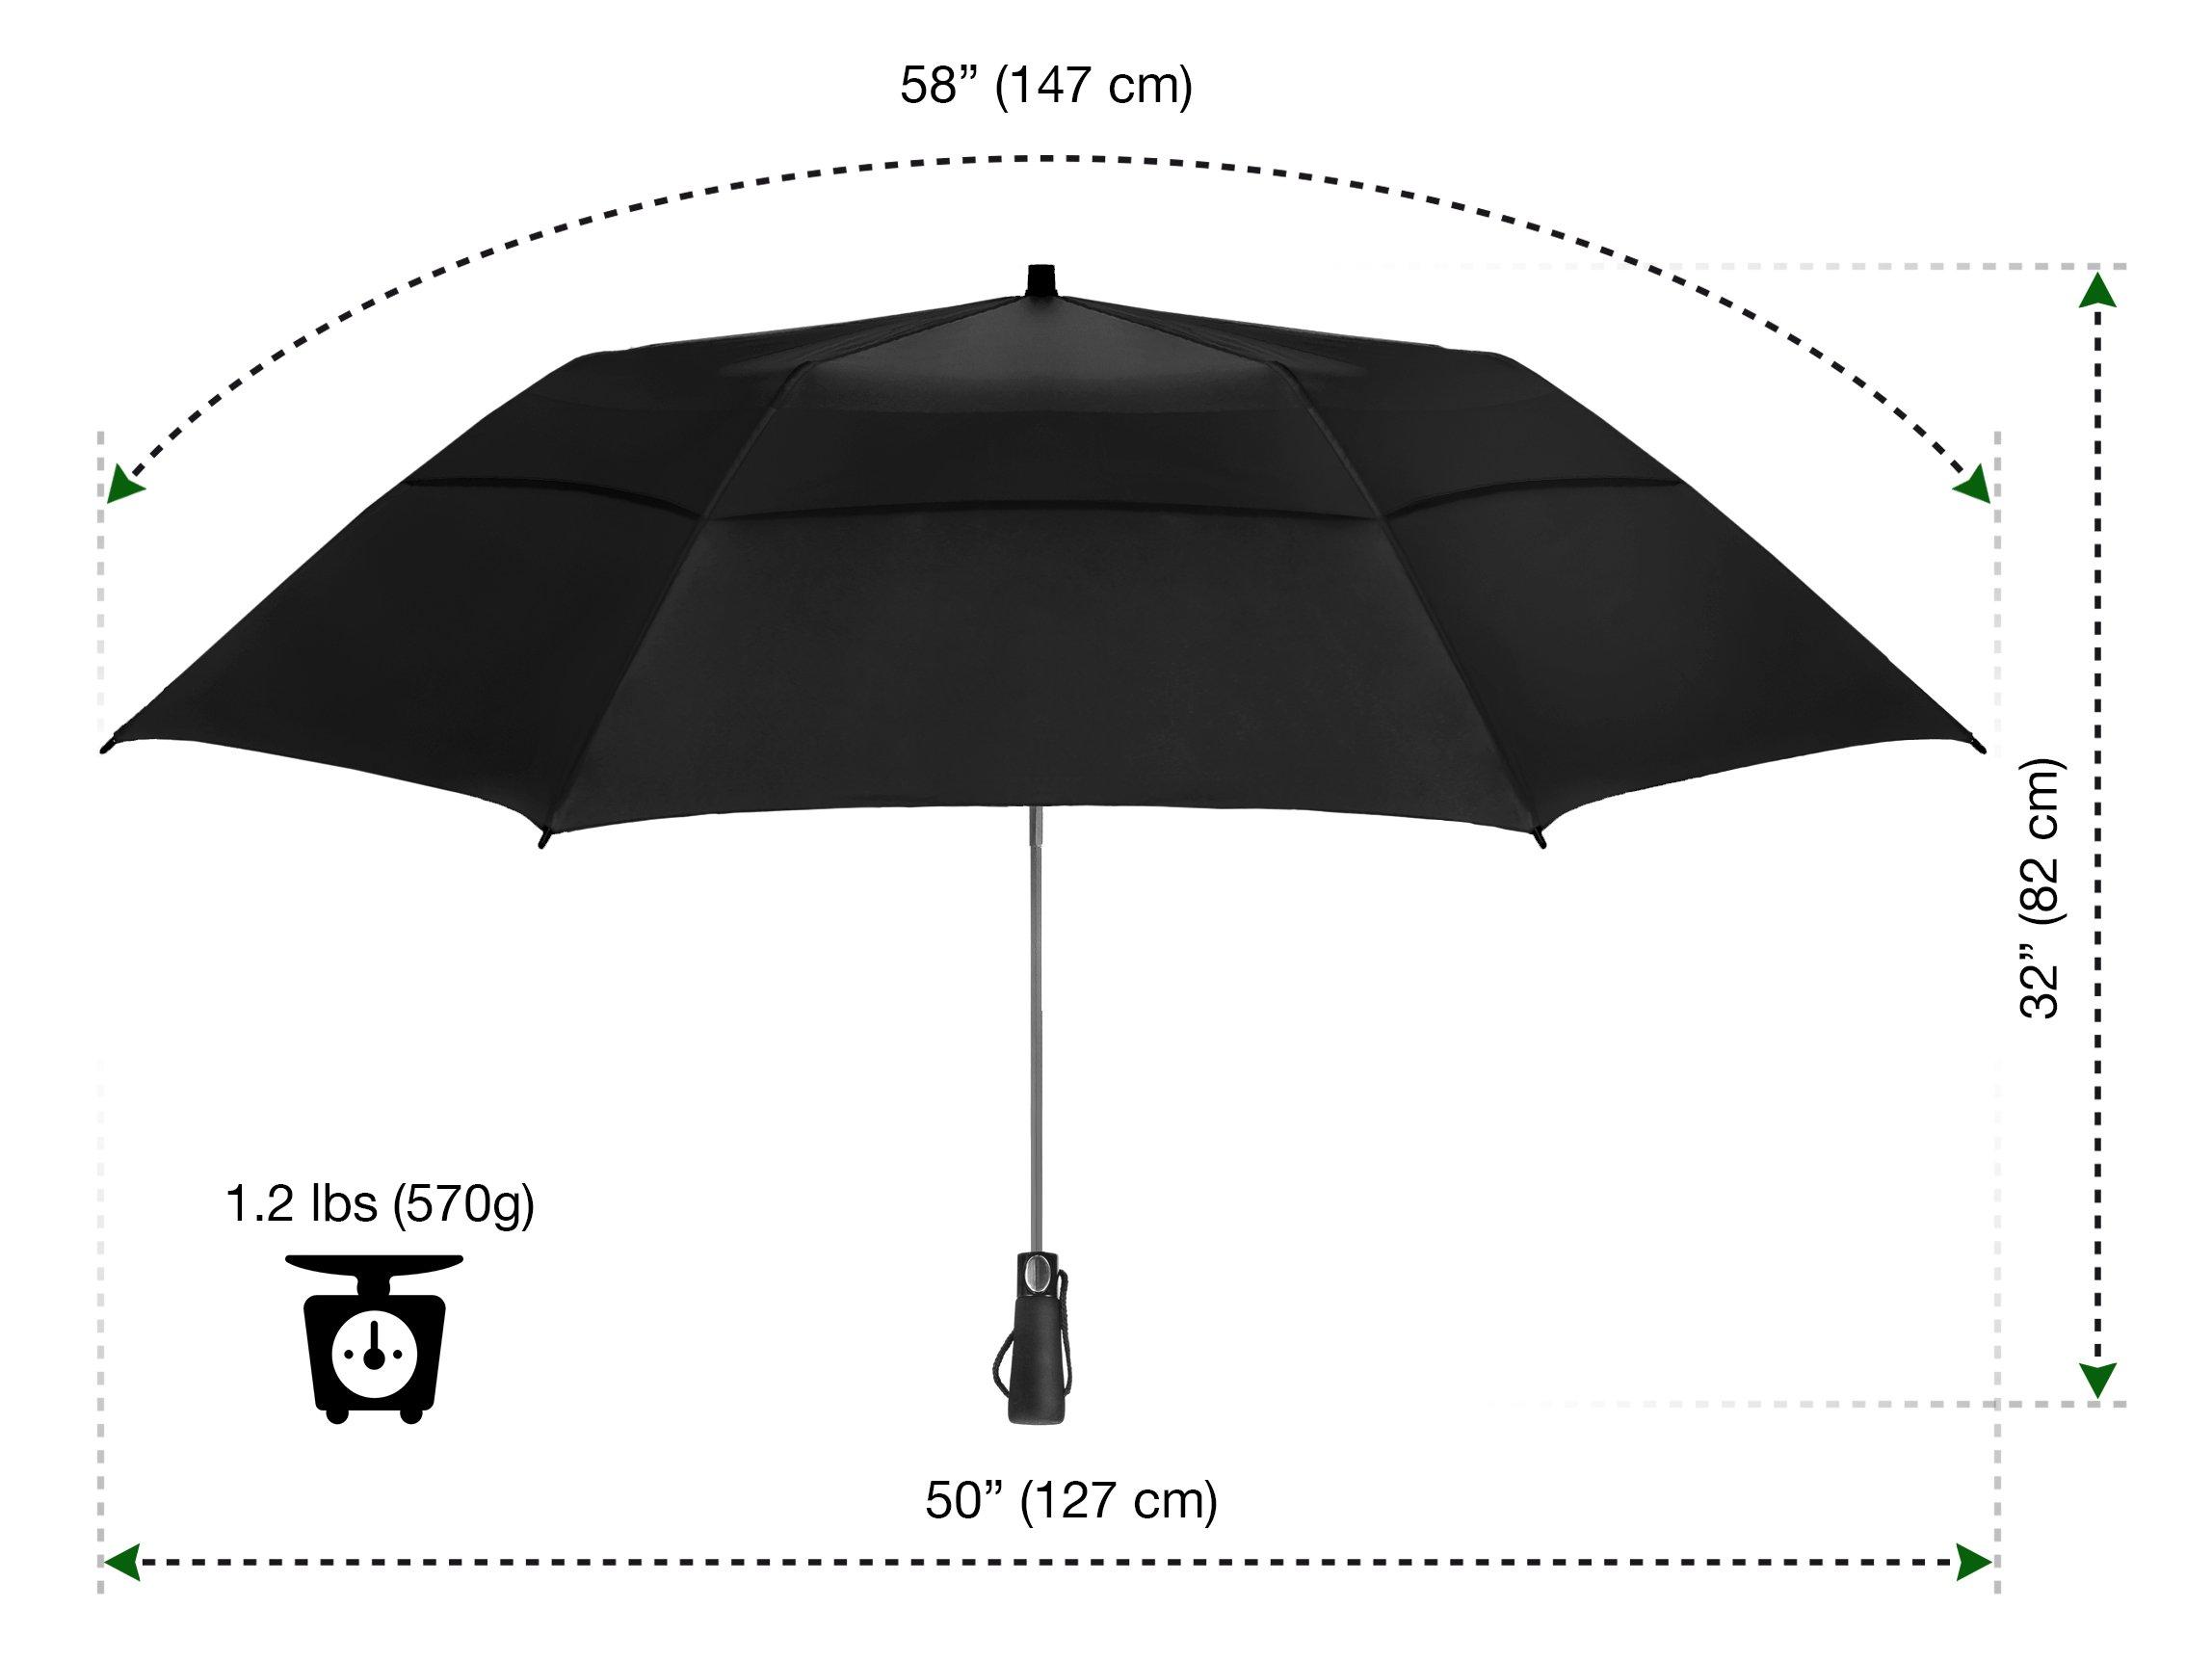 Eez Y 58 Inch Portable Golf Umbrella Large Windproof